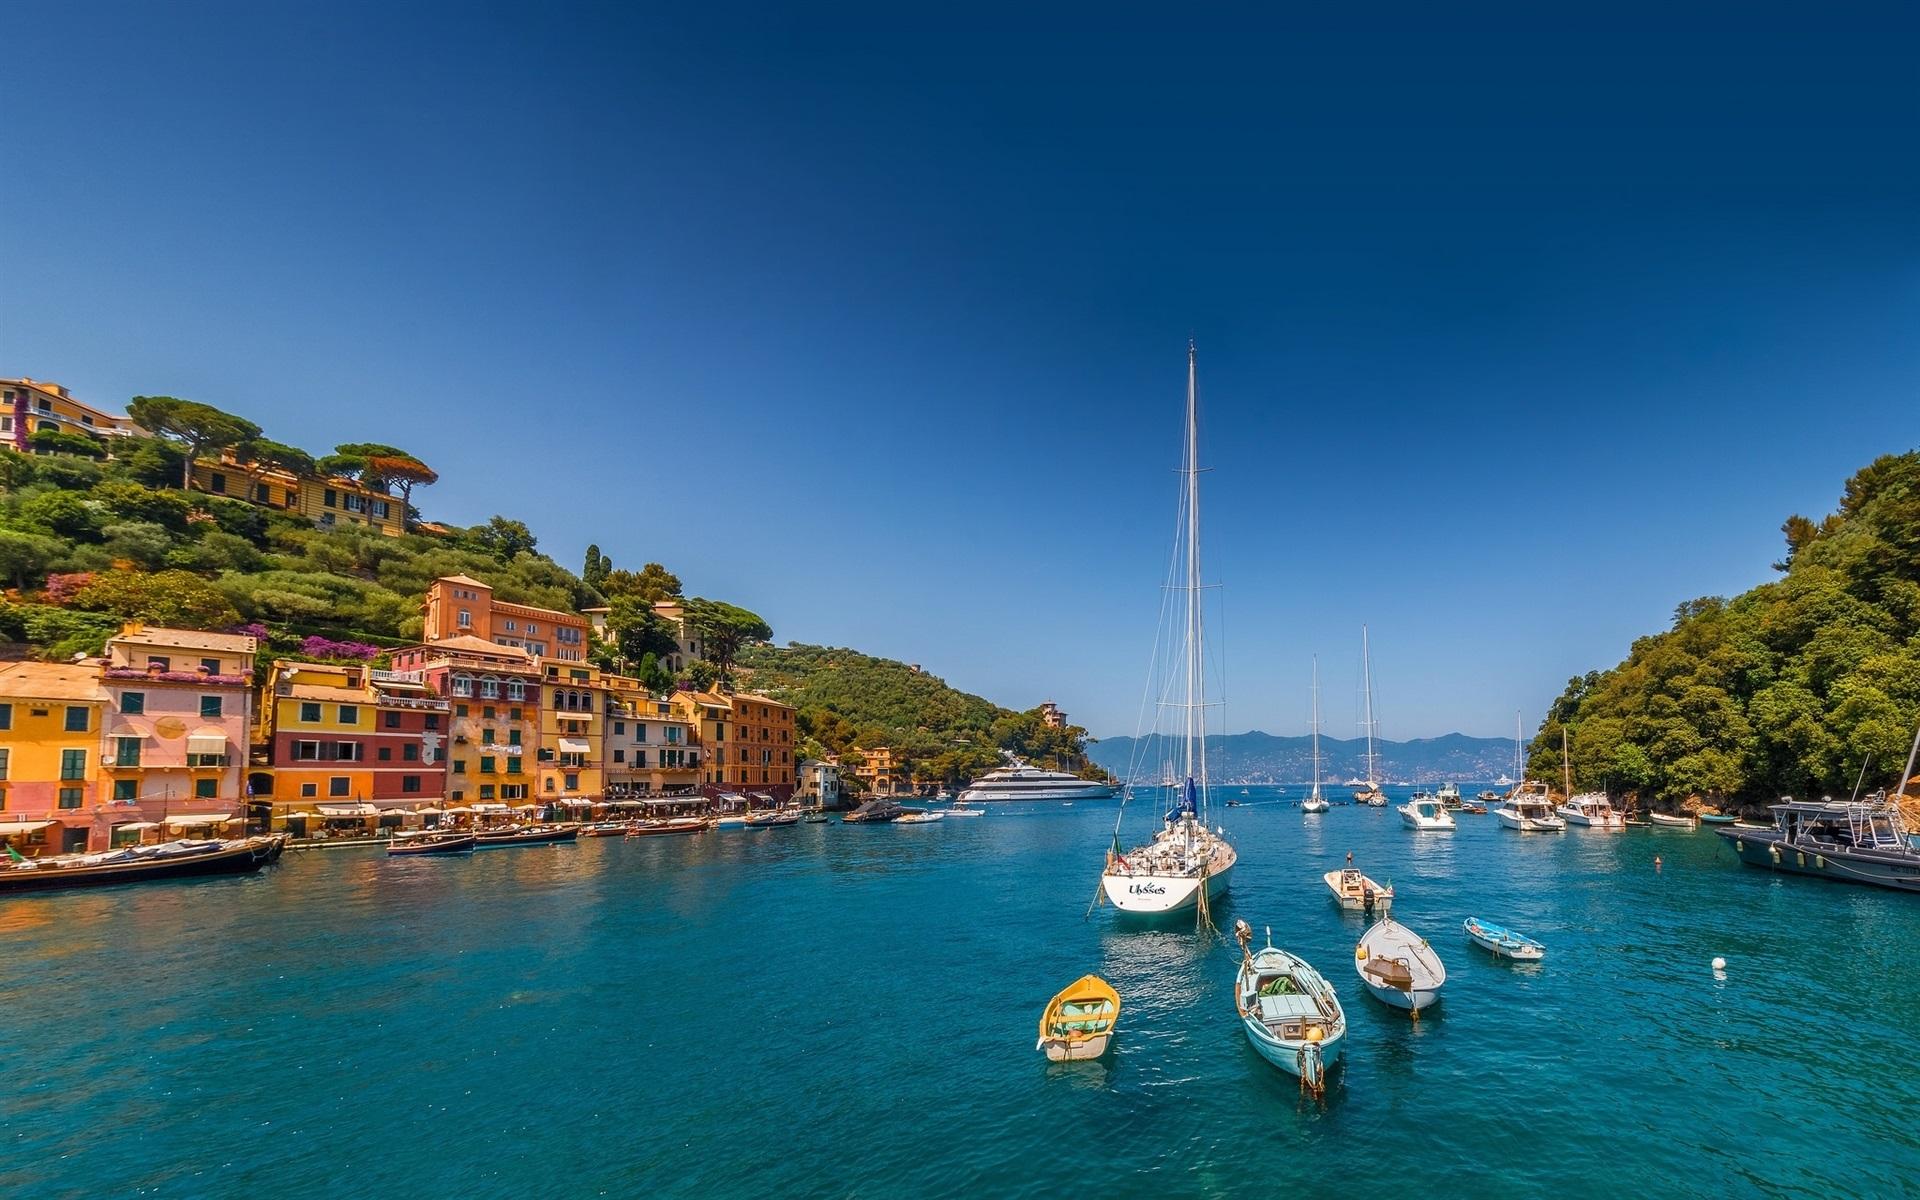 Portofino-Liguria-Italy-sea-yachts-boats-houses-mountains_1920x1200